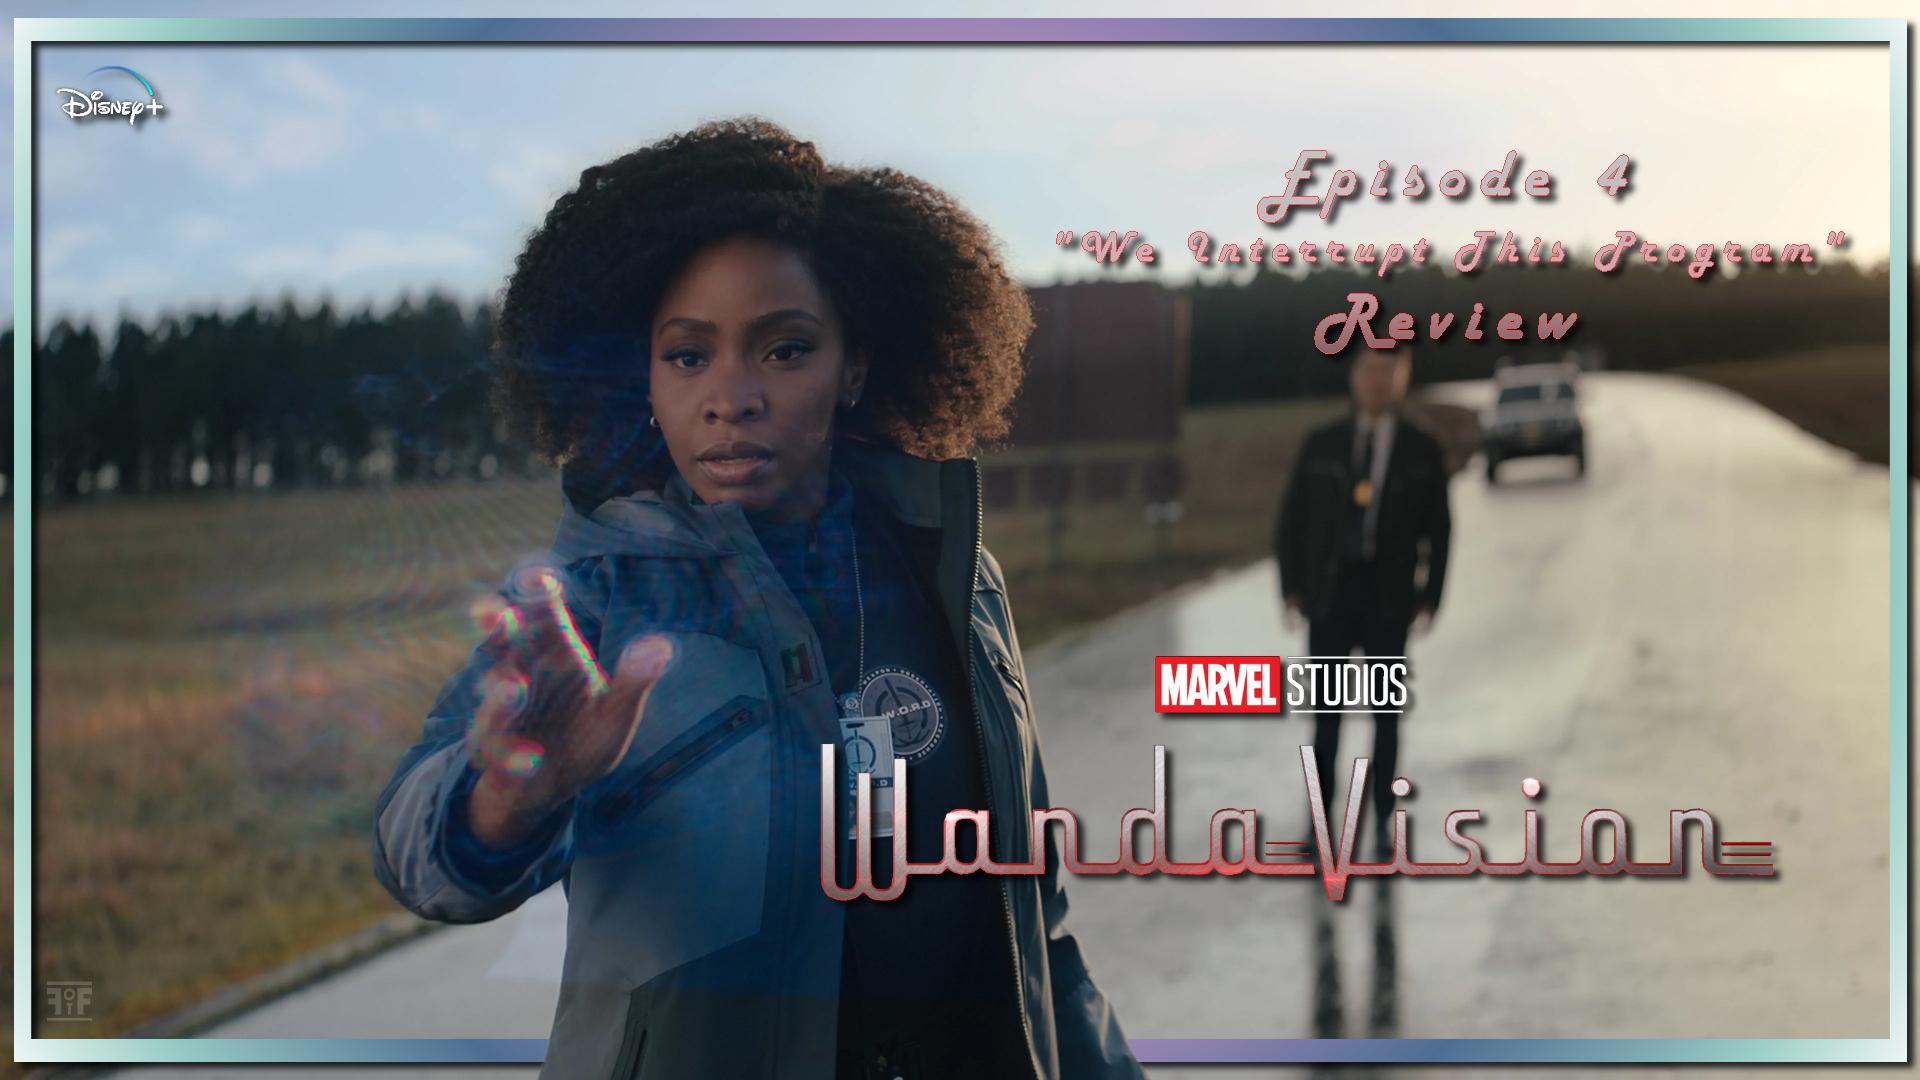 WandaVision (Episode 4: We Interrupt This Program)